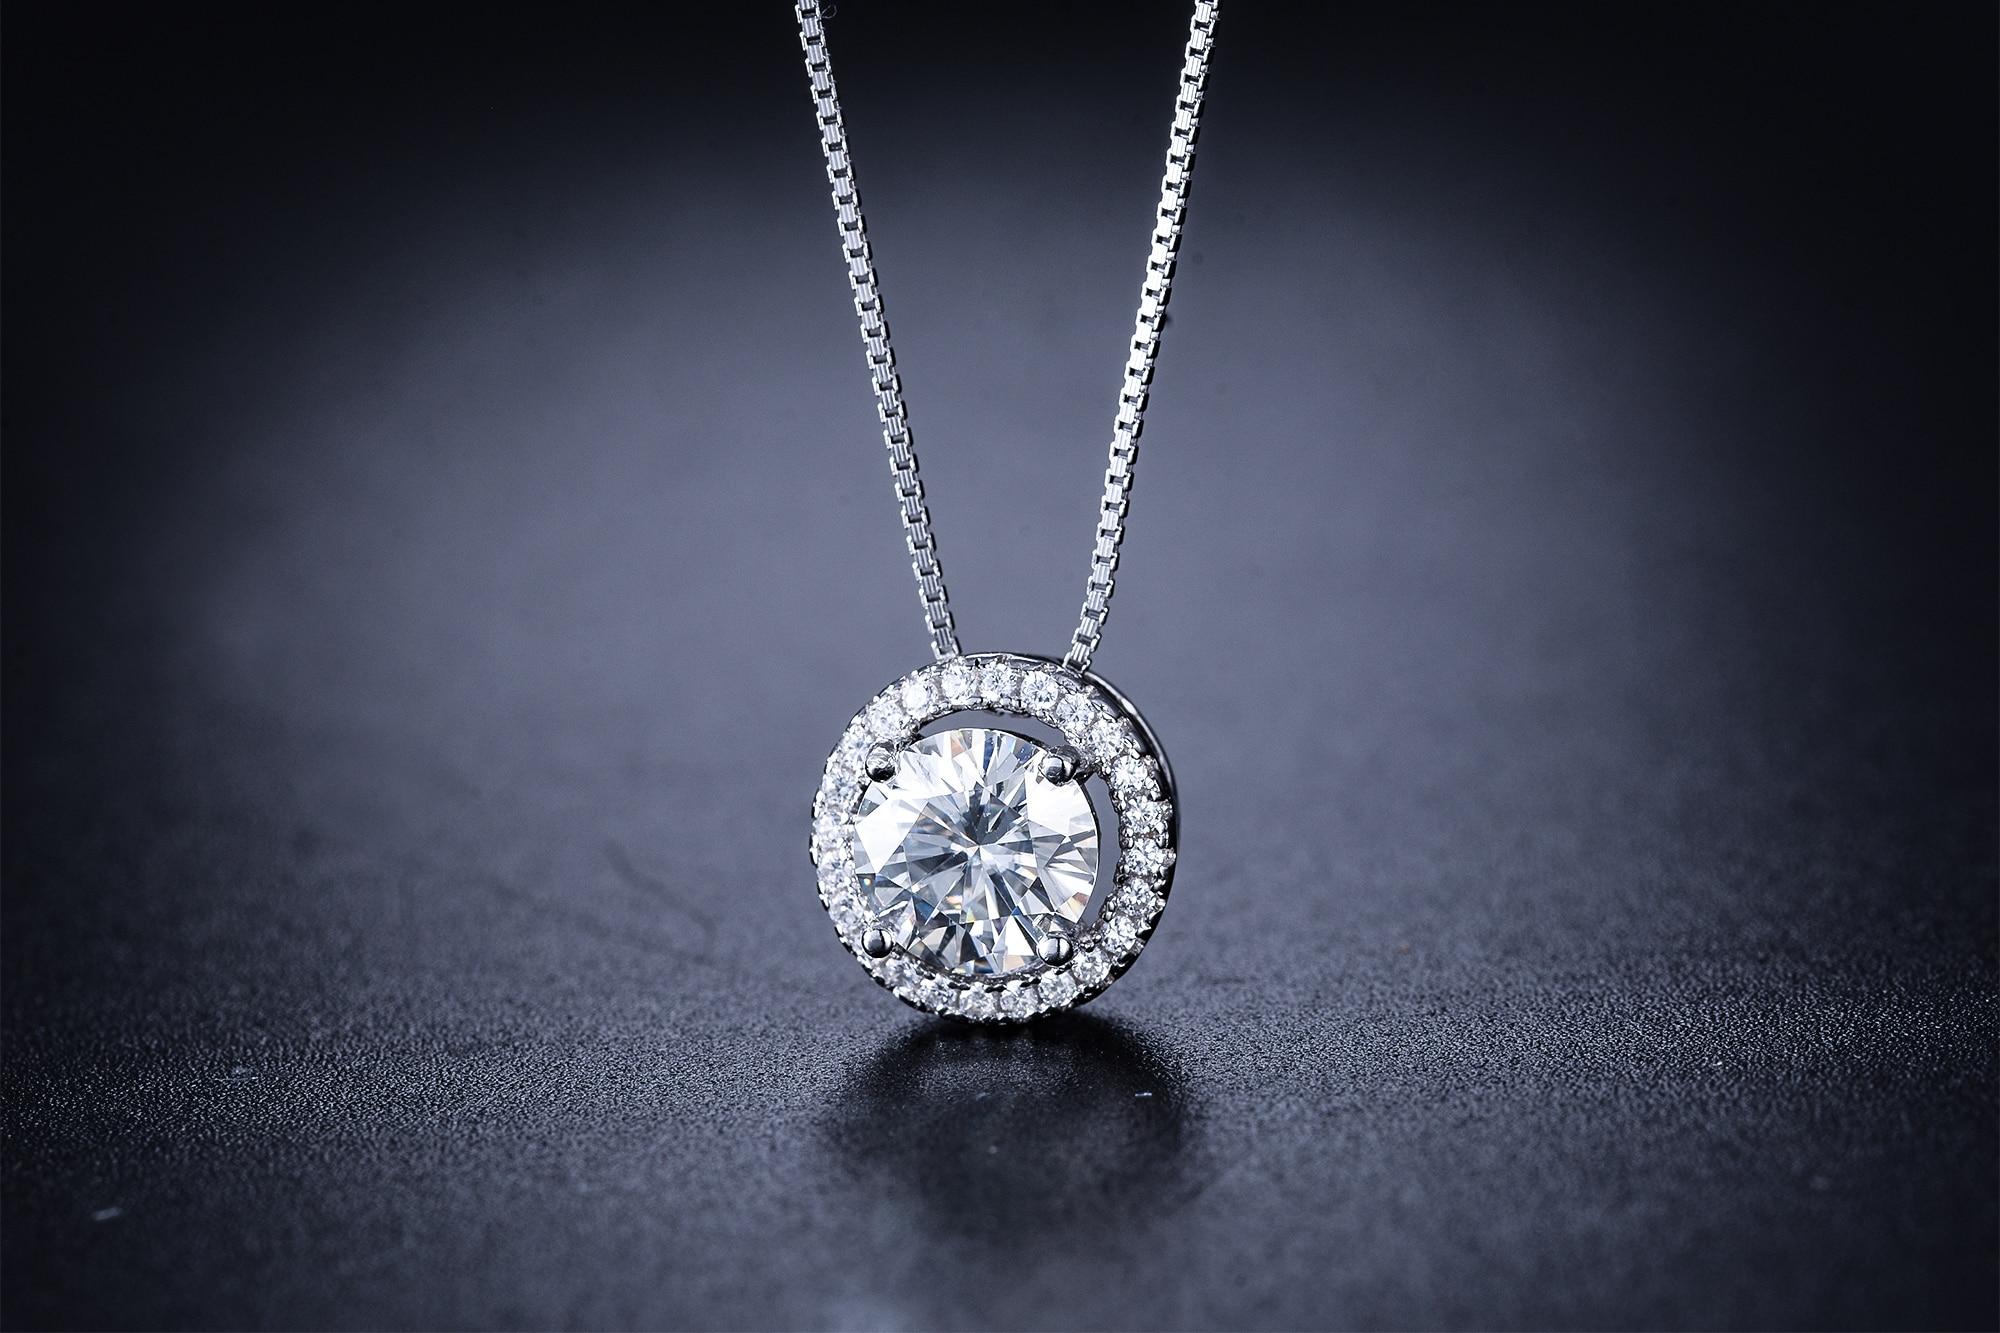 Kkmall Store Round Silver Moissanite Pendants 1.00ct Luxury Moissanite Pendants Jewelry Girlfriend Gift Moissanite necklaces